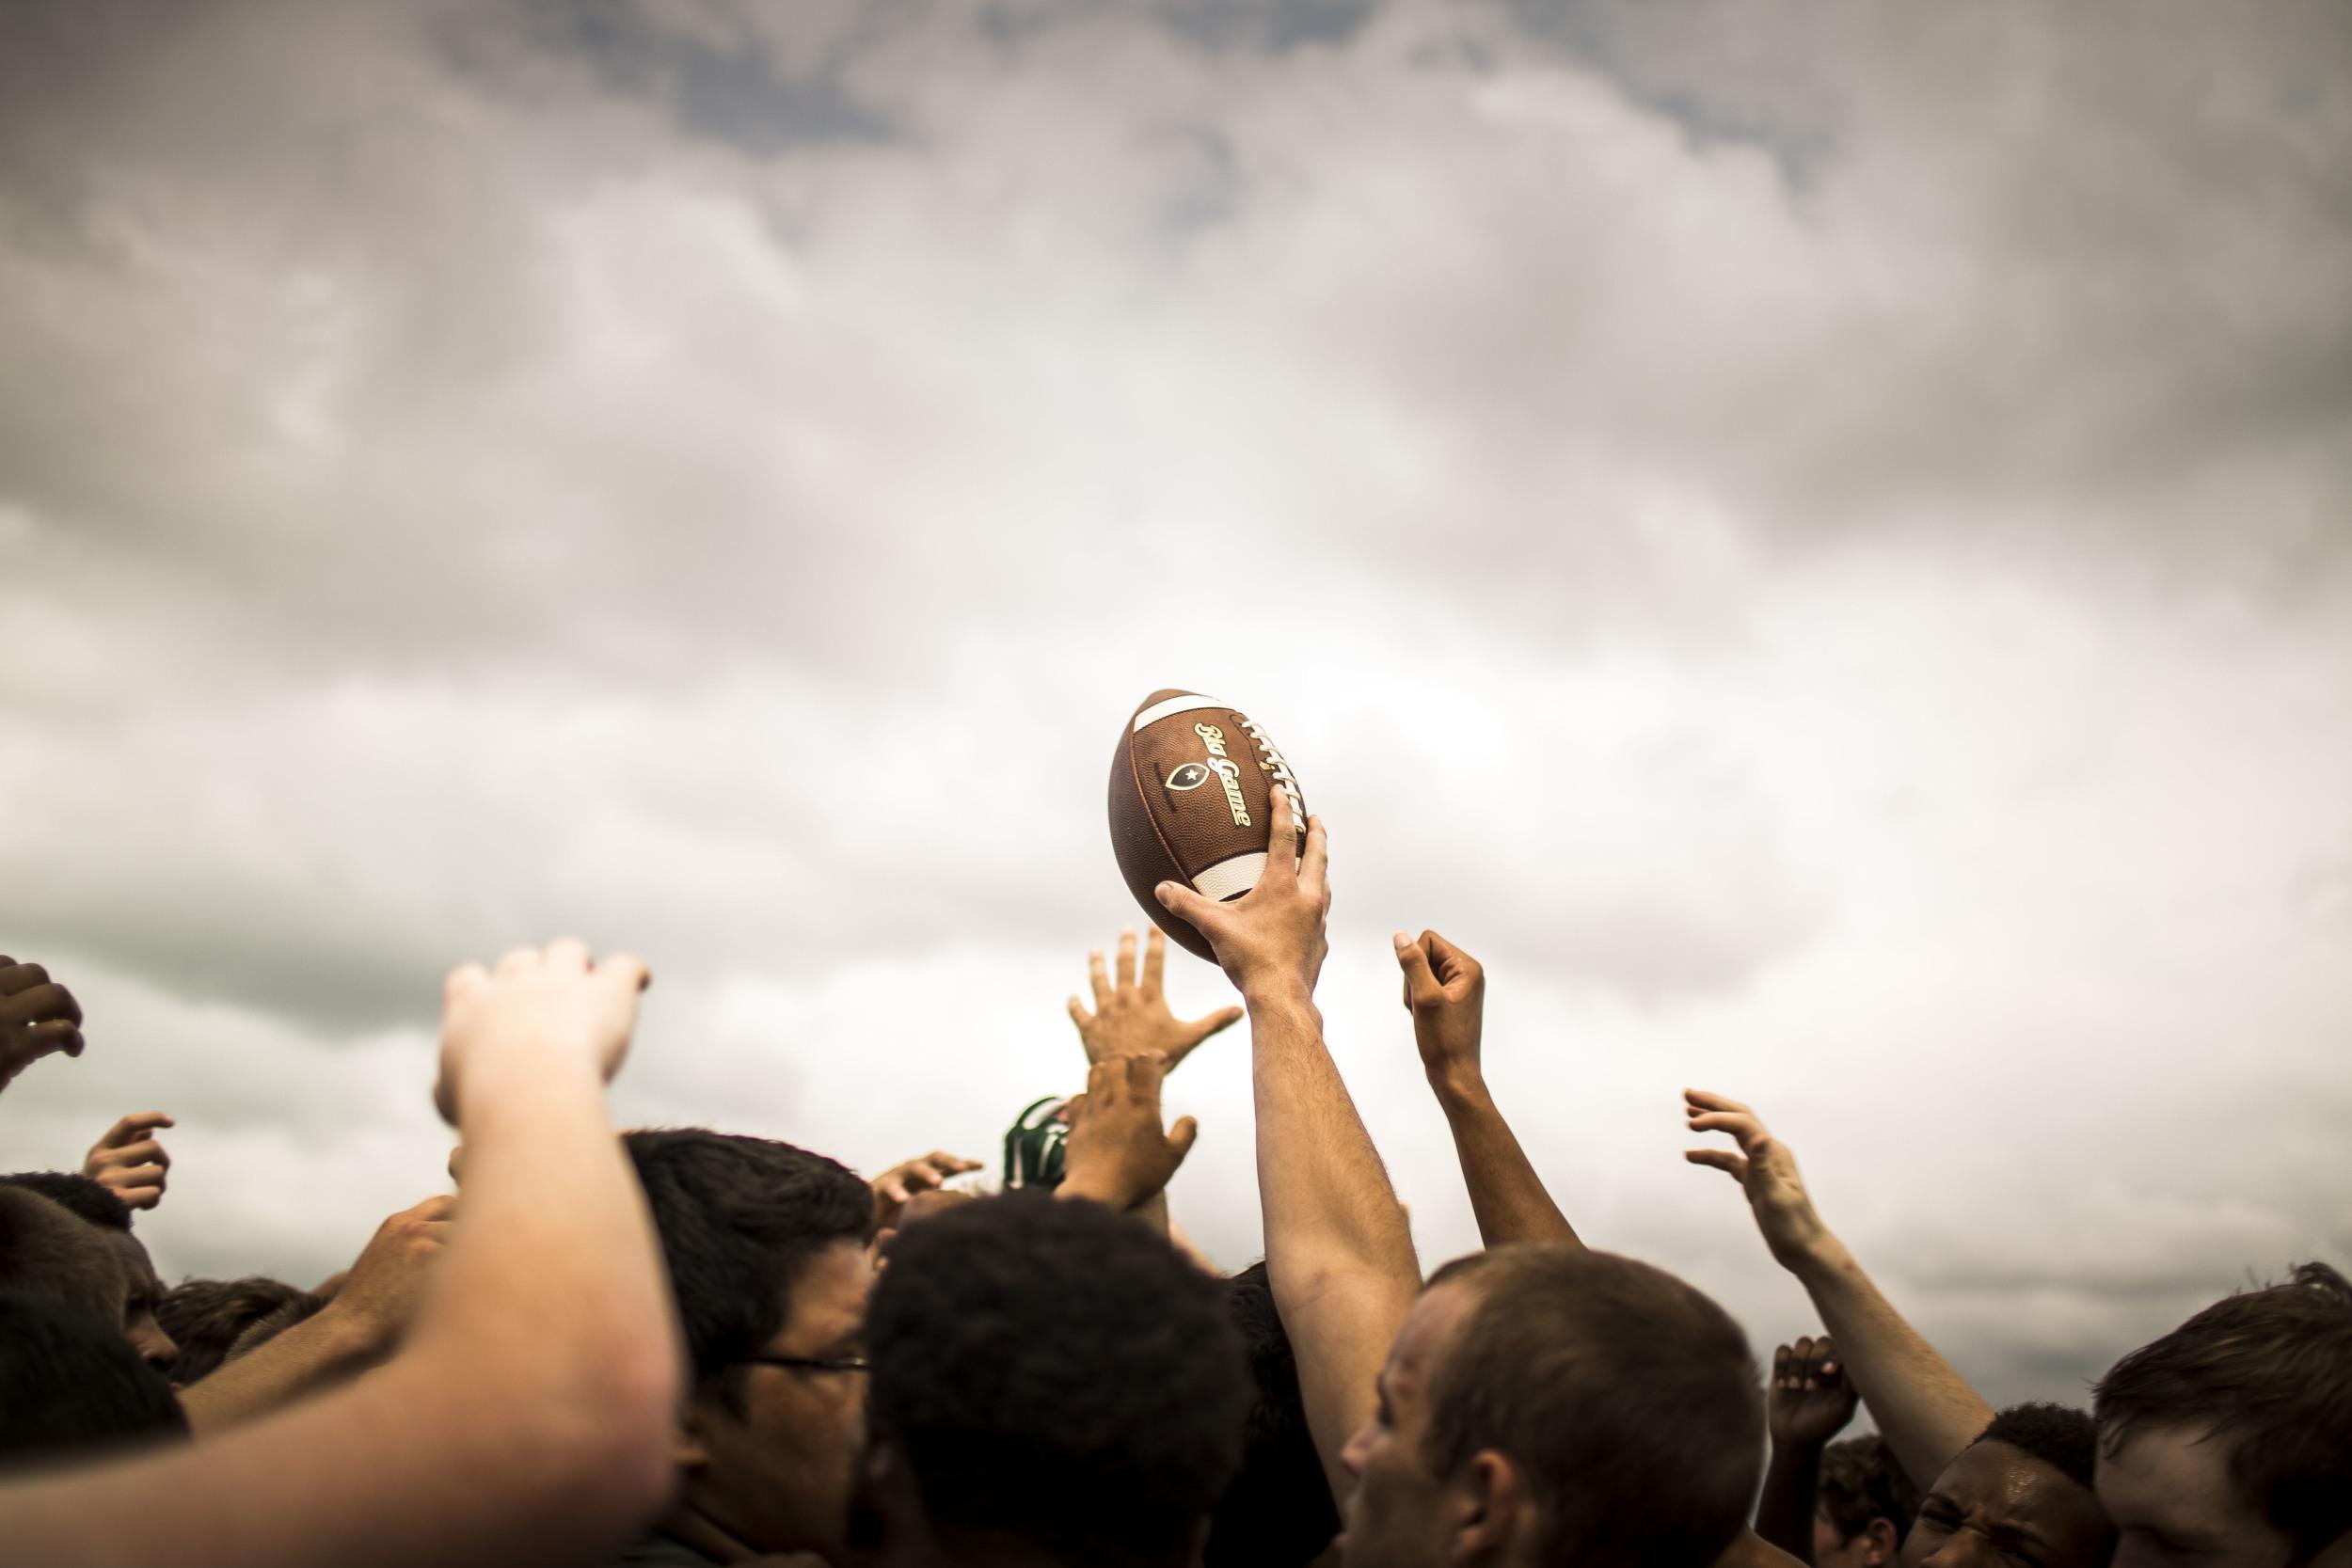 20150507_globe_brenham_football_coaches_0077.jpg